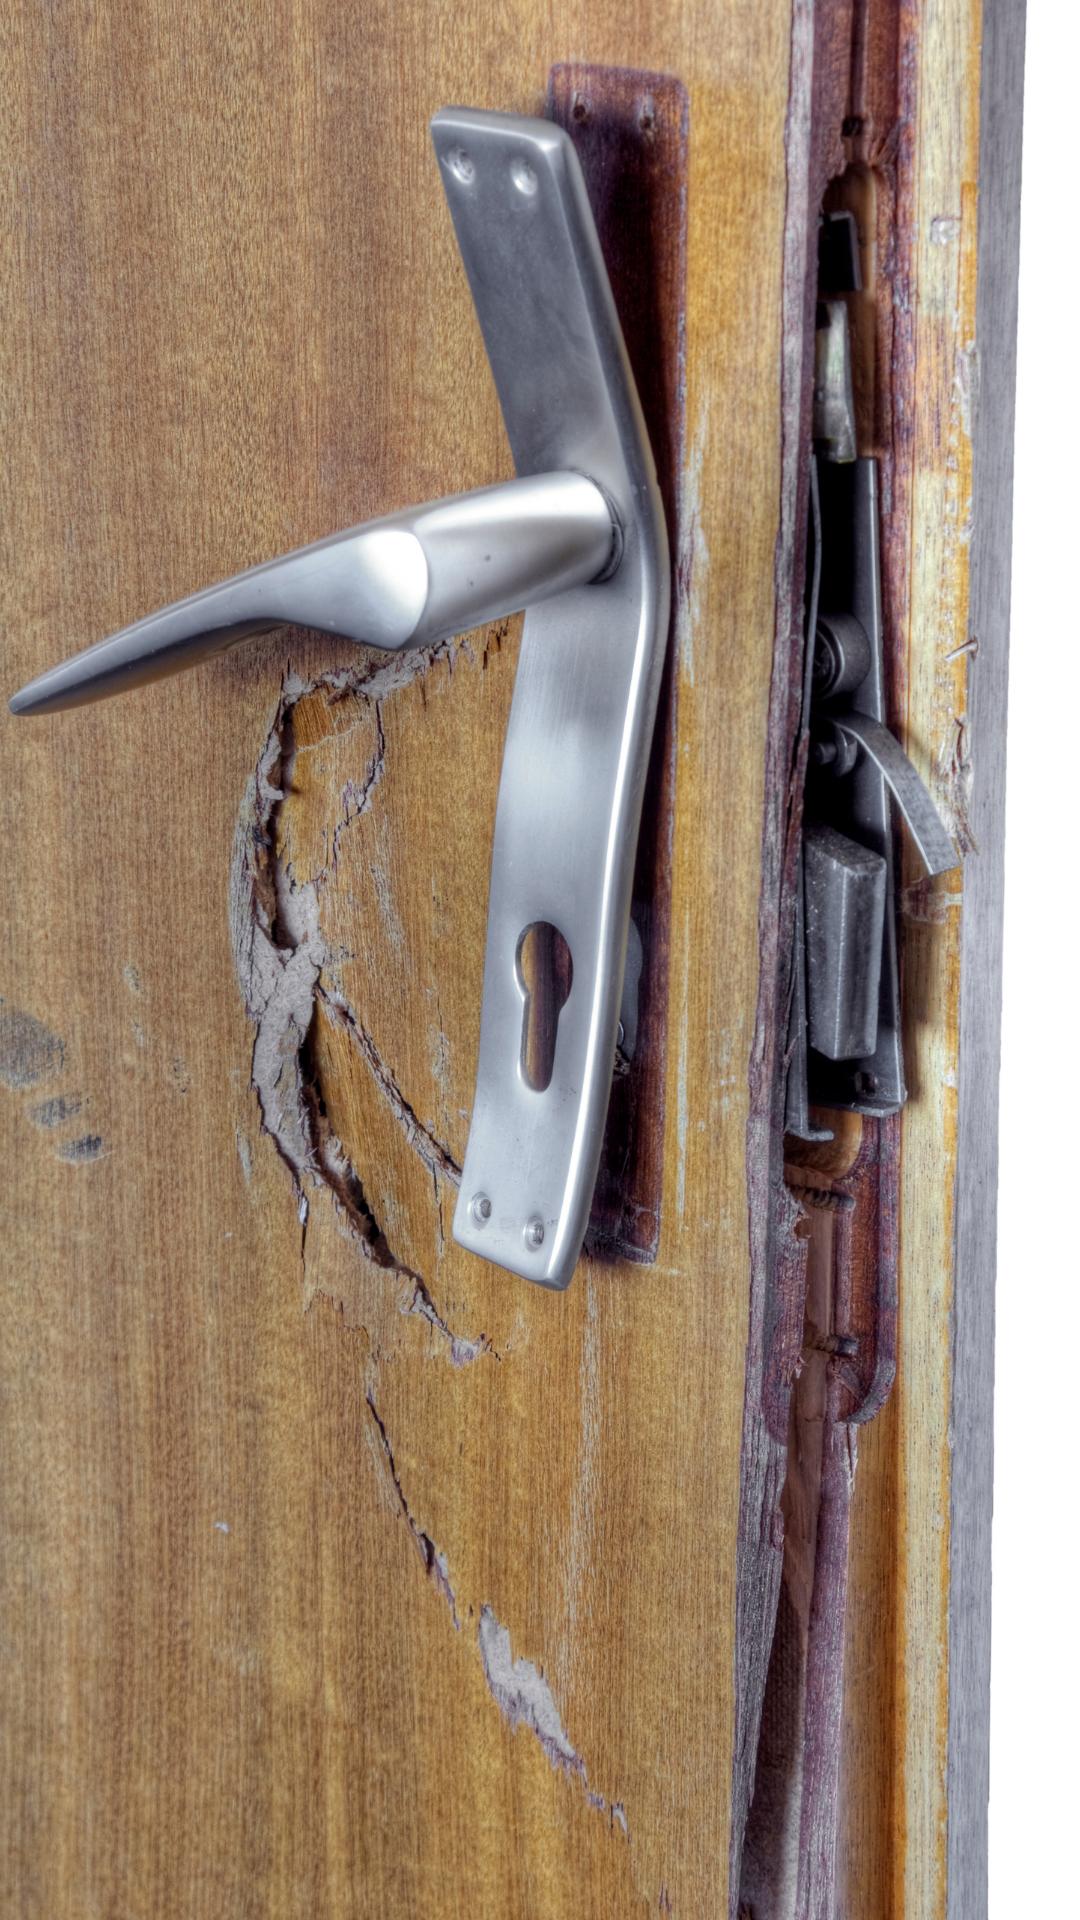 broke door locksmith needing an emergency locksmith